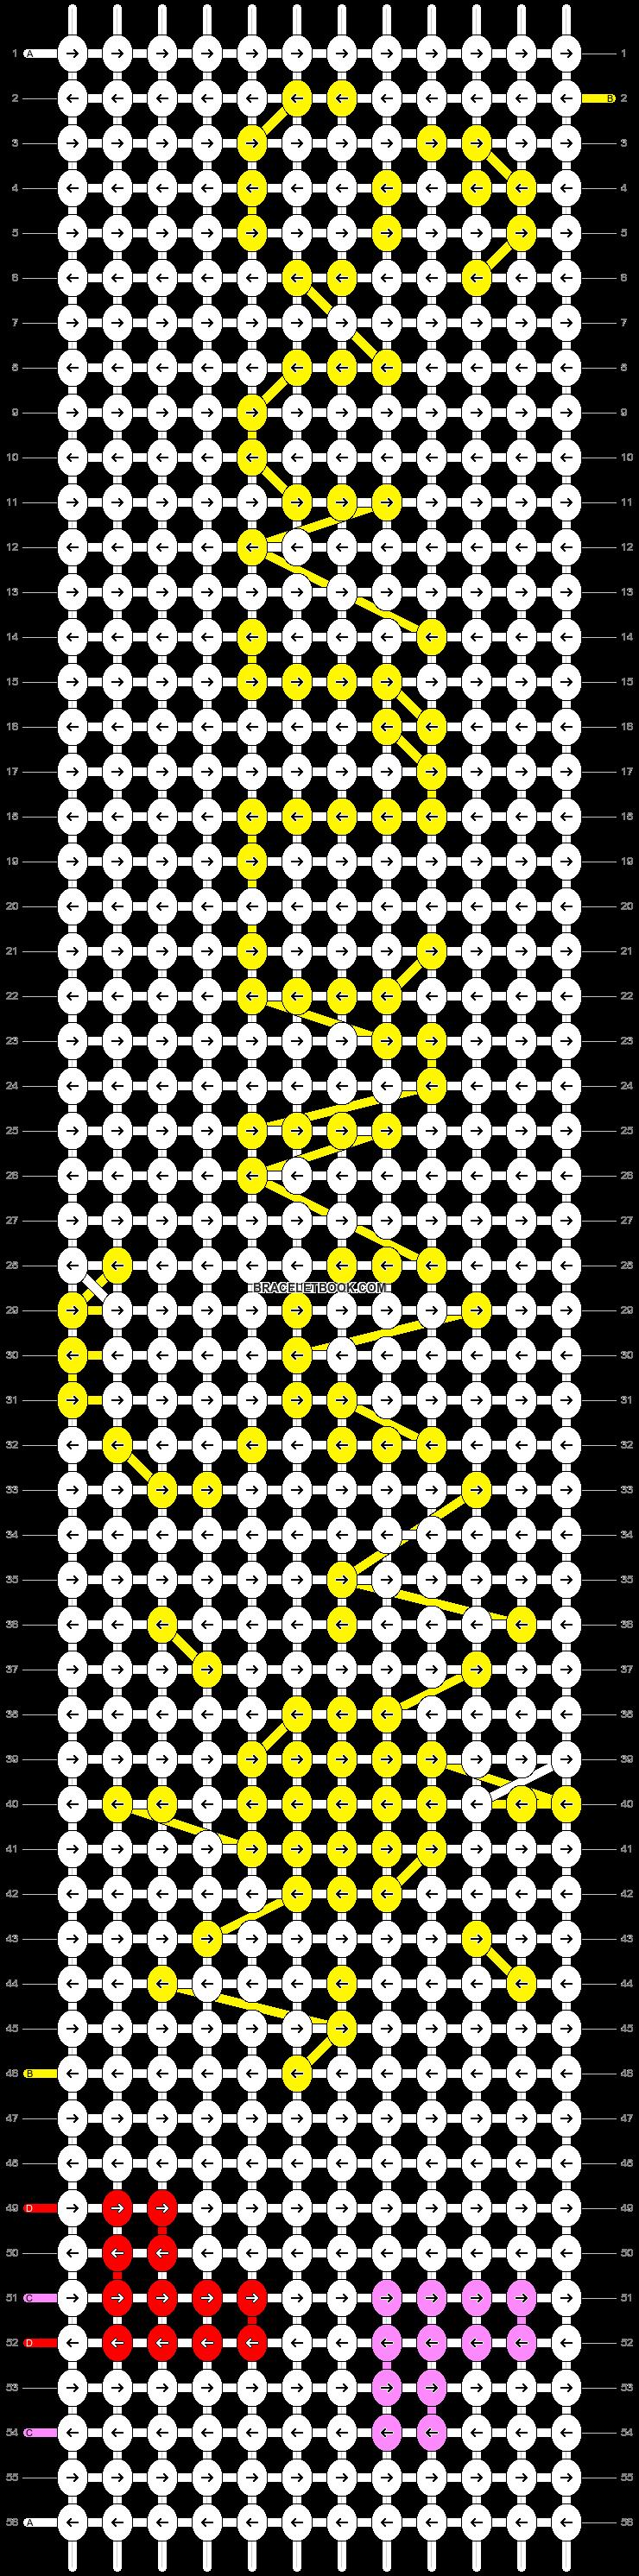 Alpha pattern #8056 pattern